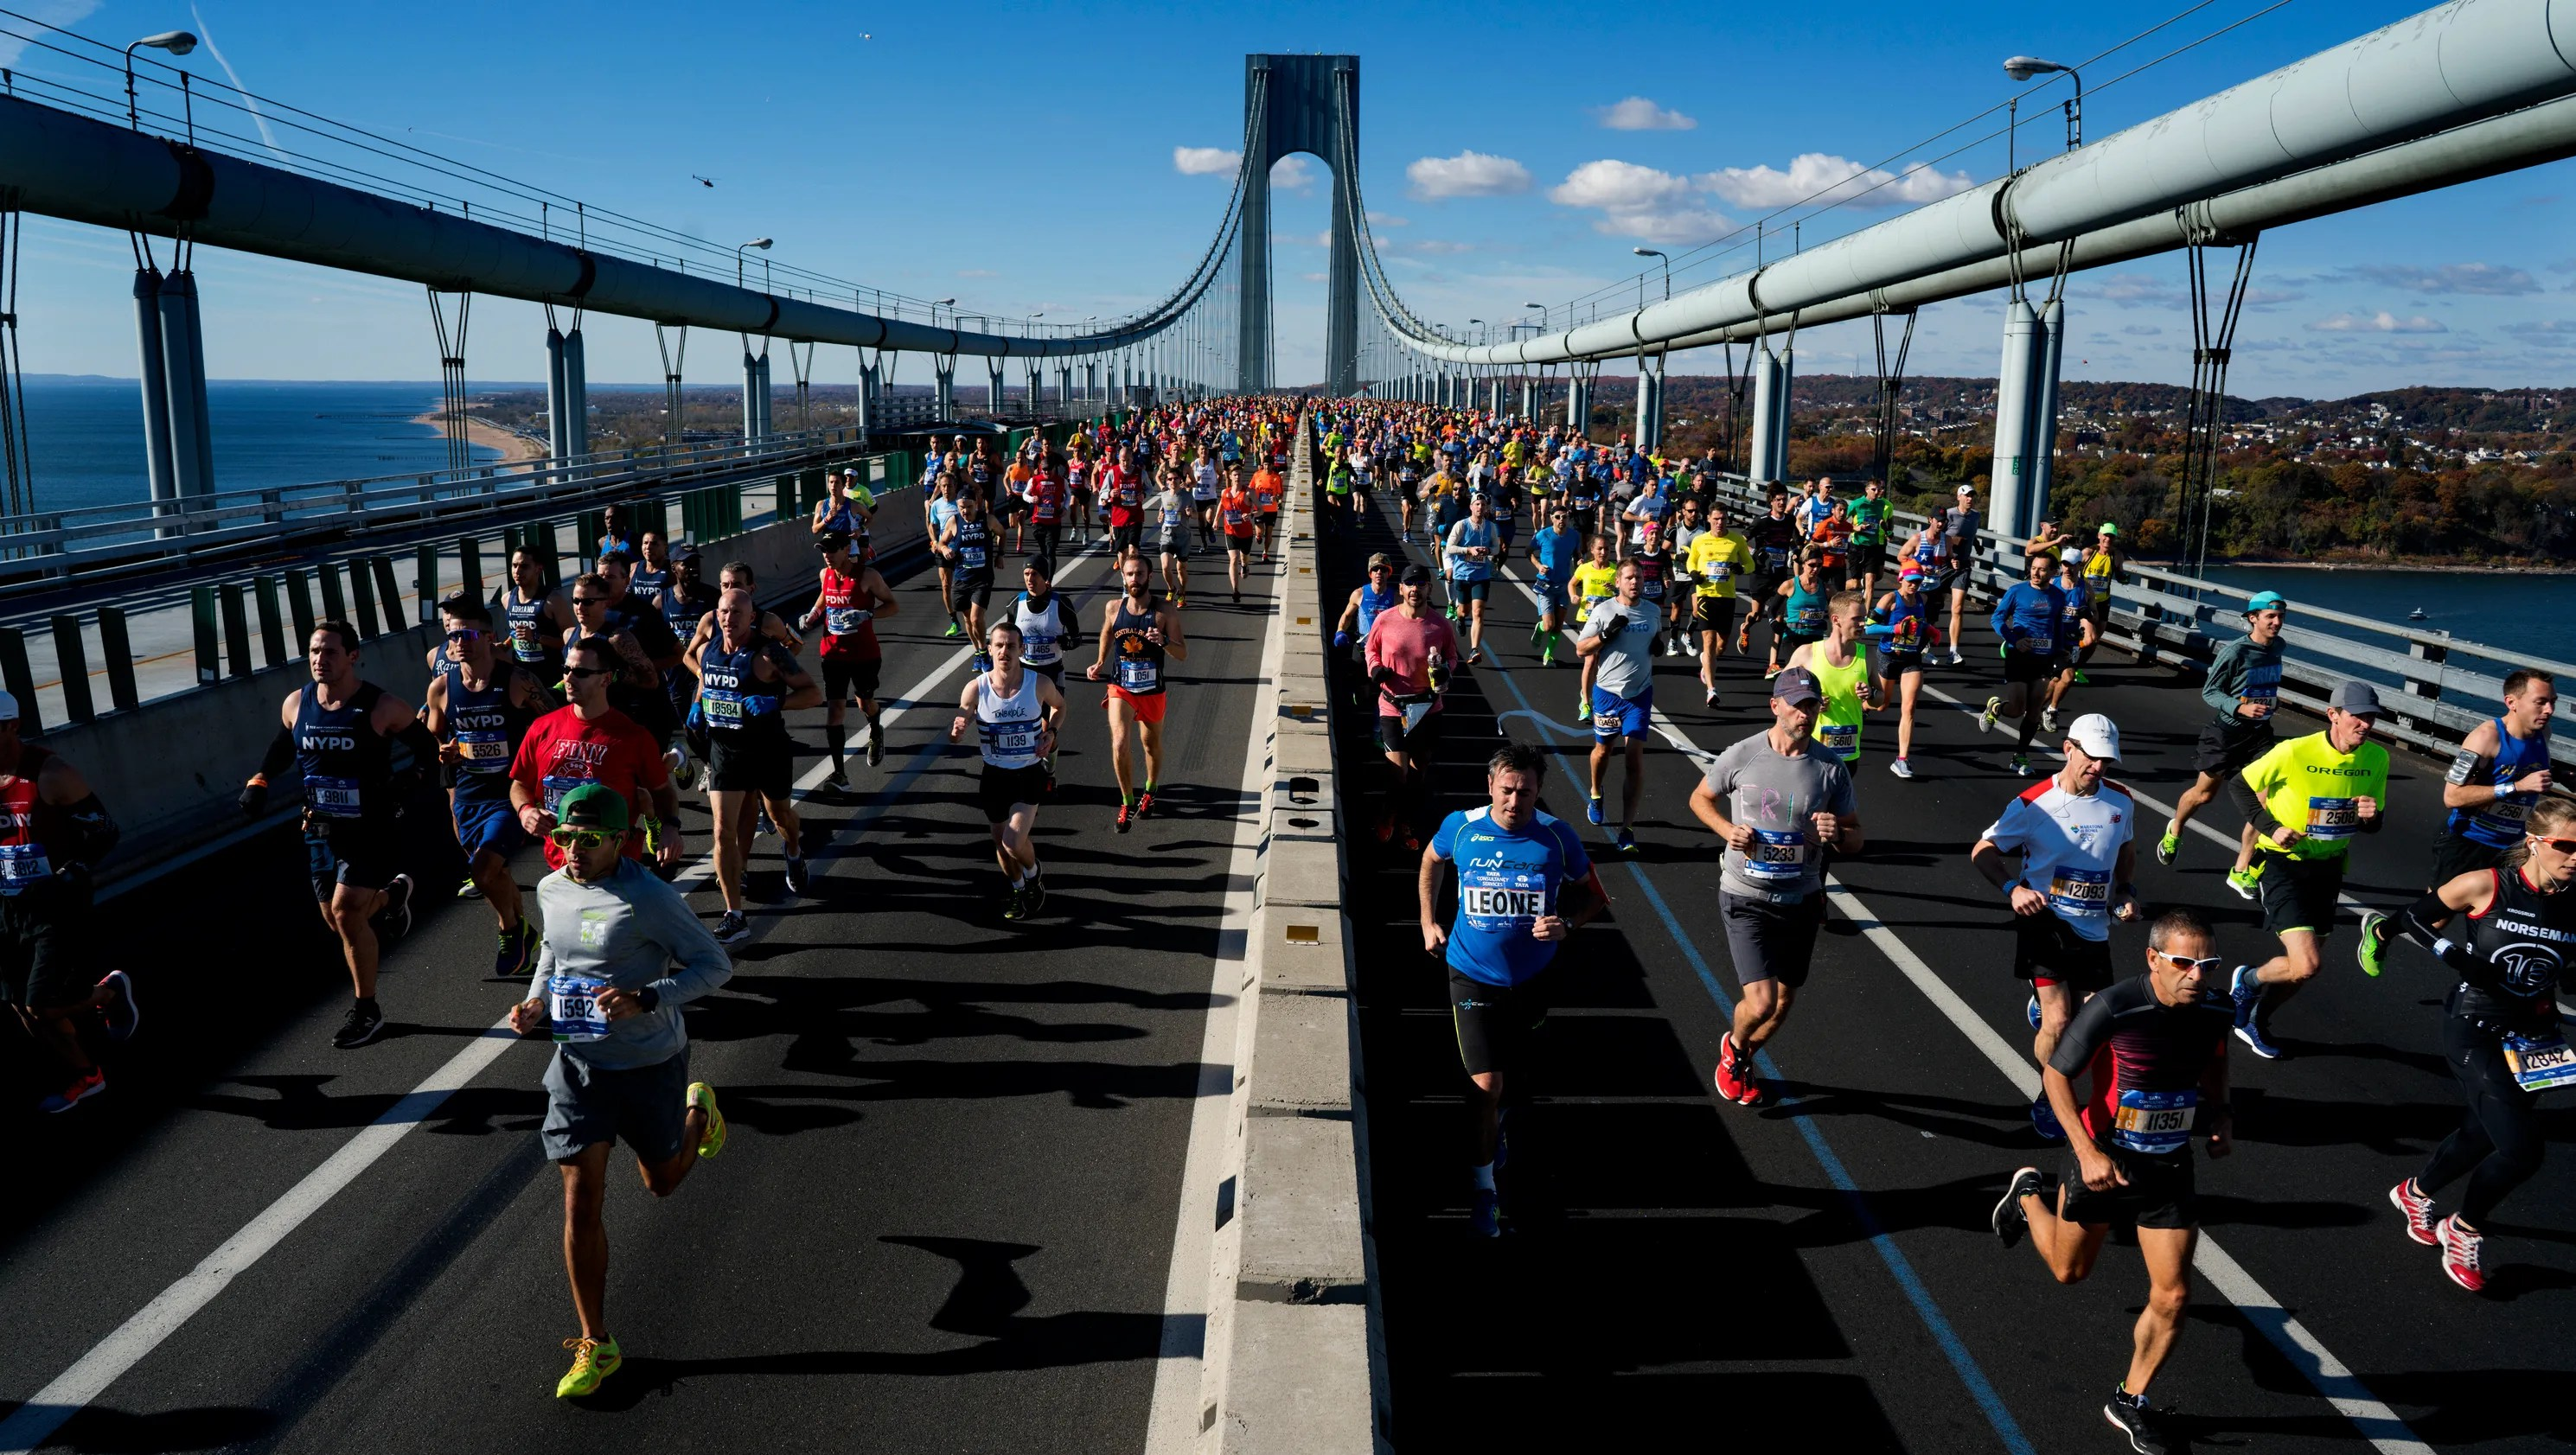 Stanley Biwott Drops Out Of New York City Marathon